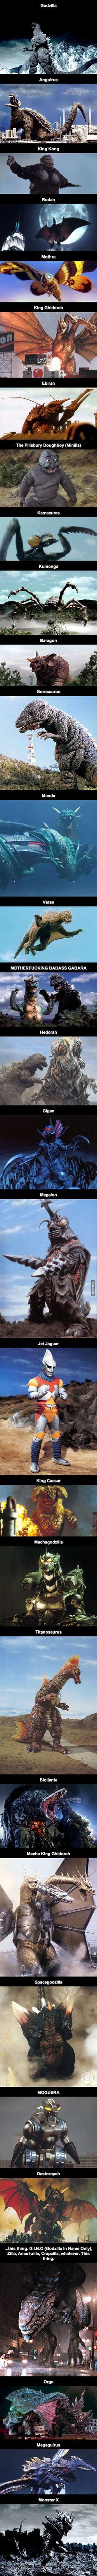 Godzilla Kaiju (Monsters)